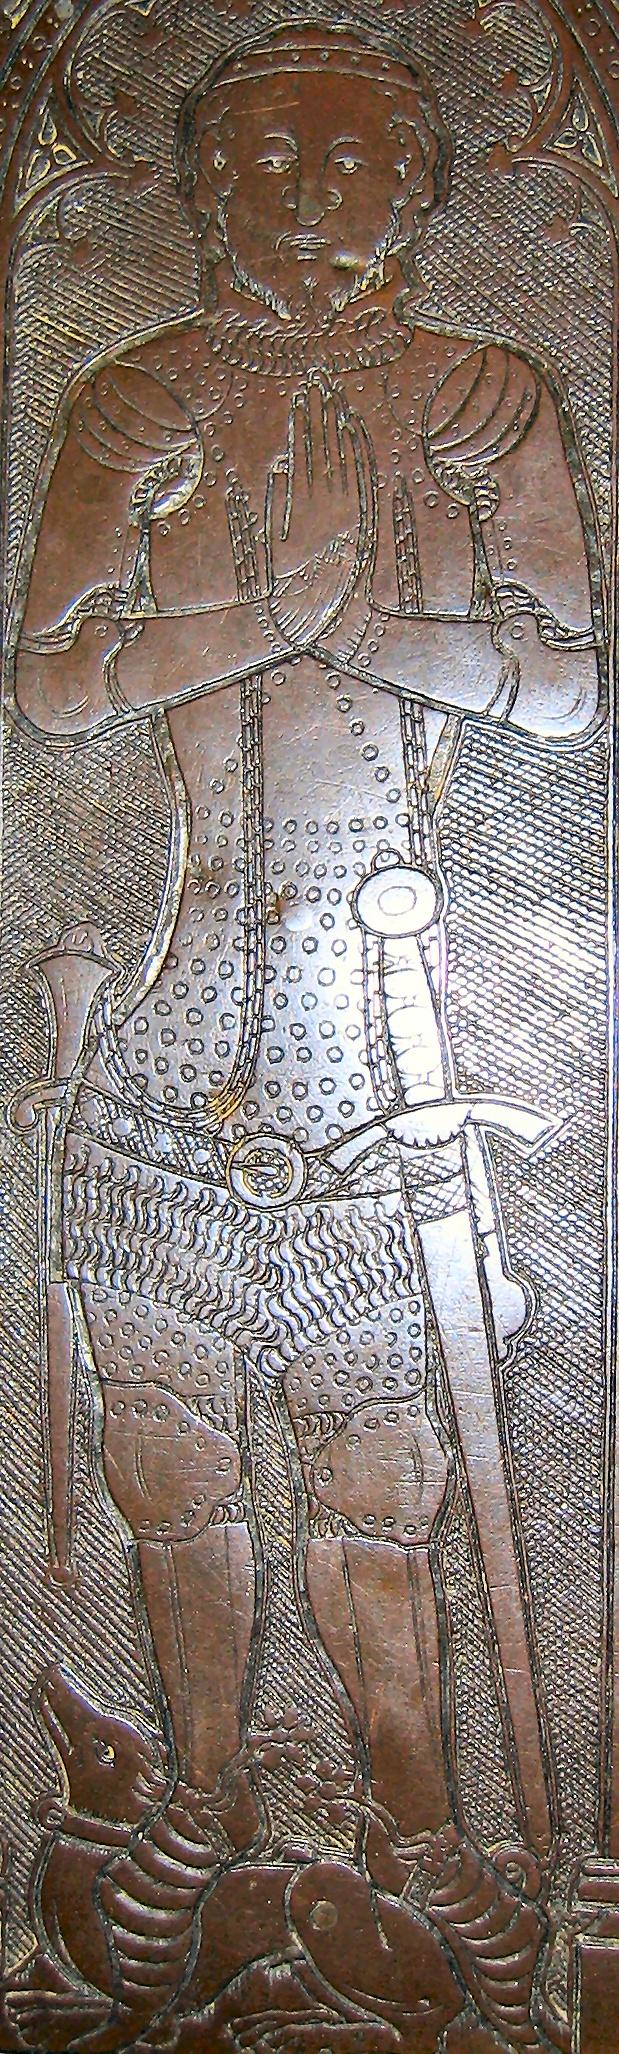 Ralph de Knevyton, died 1370    Aveley. Tiny waist, hip pop, and stepping on a wiener dog!